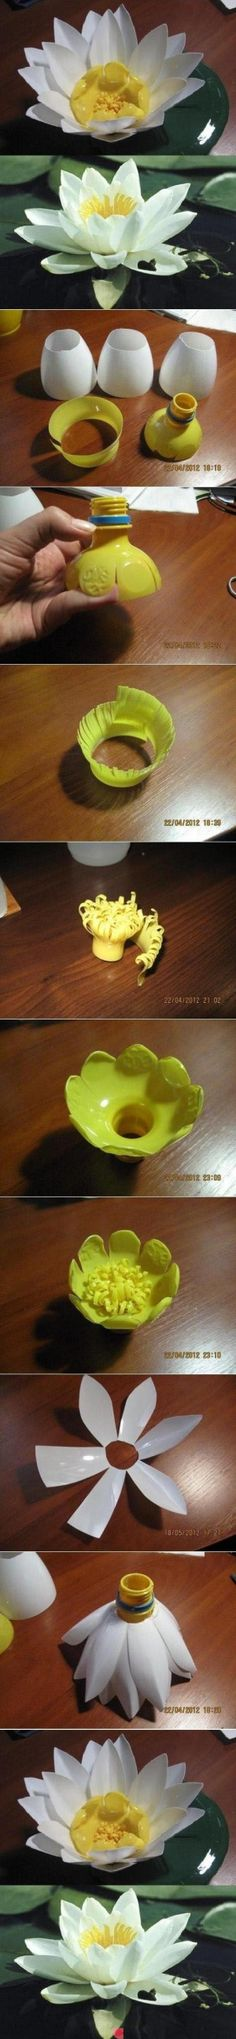 Upcycle plastic bottle = Flower DIY by Selkie~gal